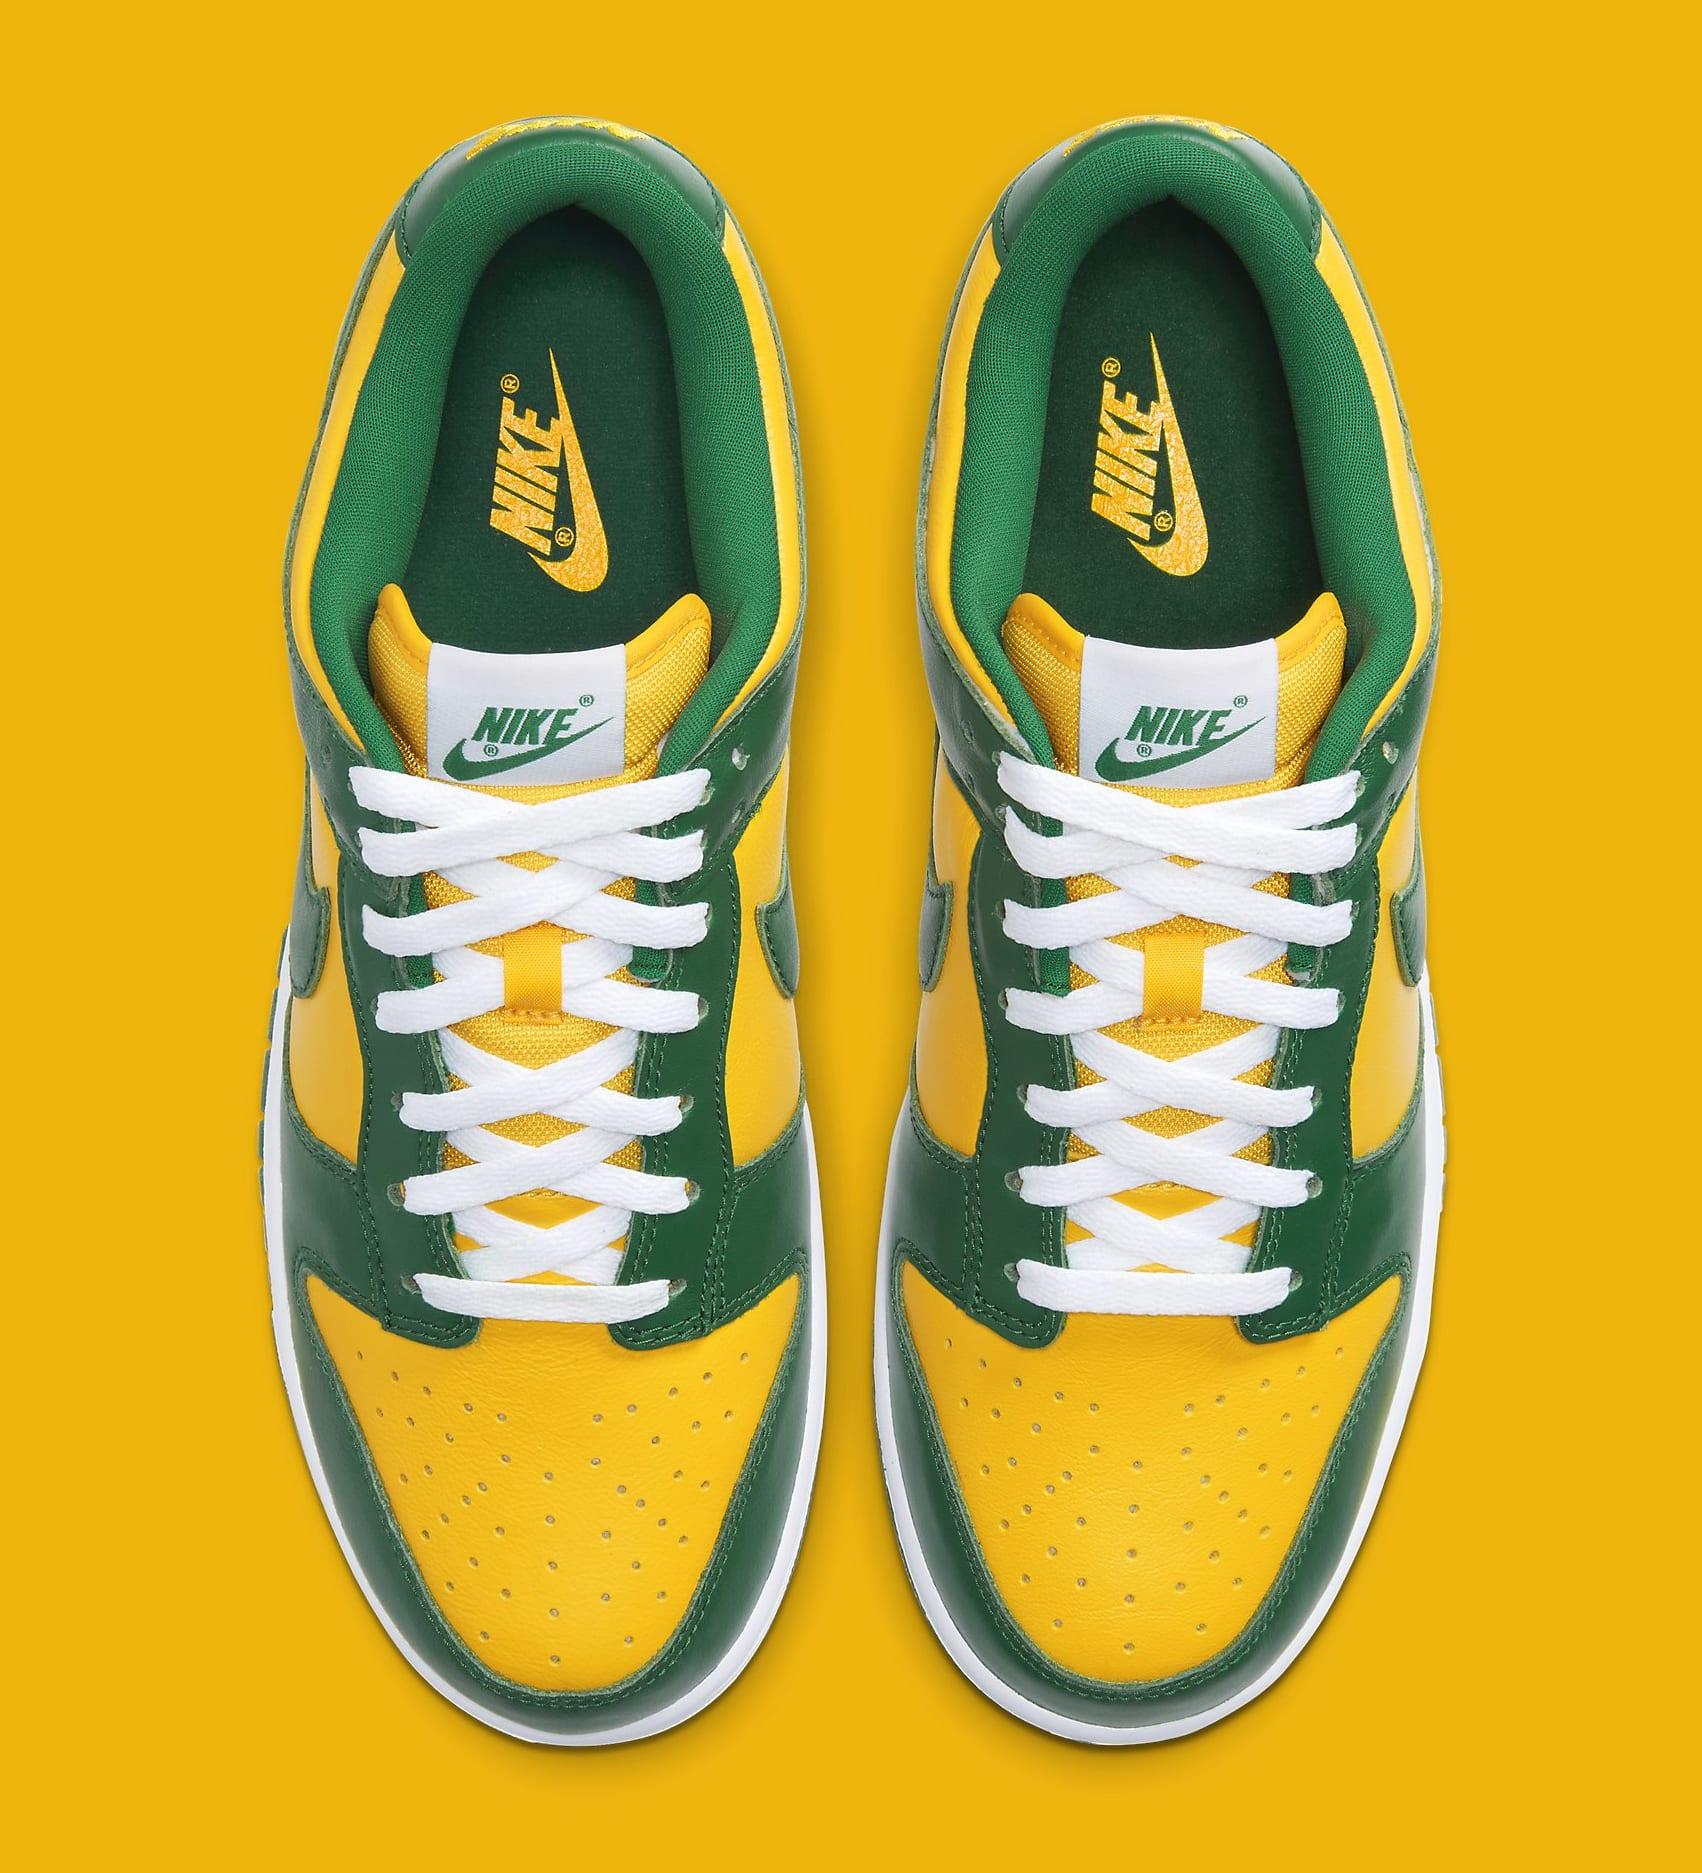 Nike Dunk Low 'Brazil' 2020 CU1727-700 Top